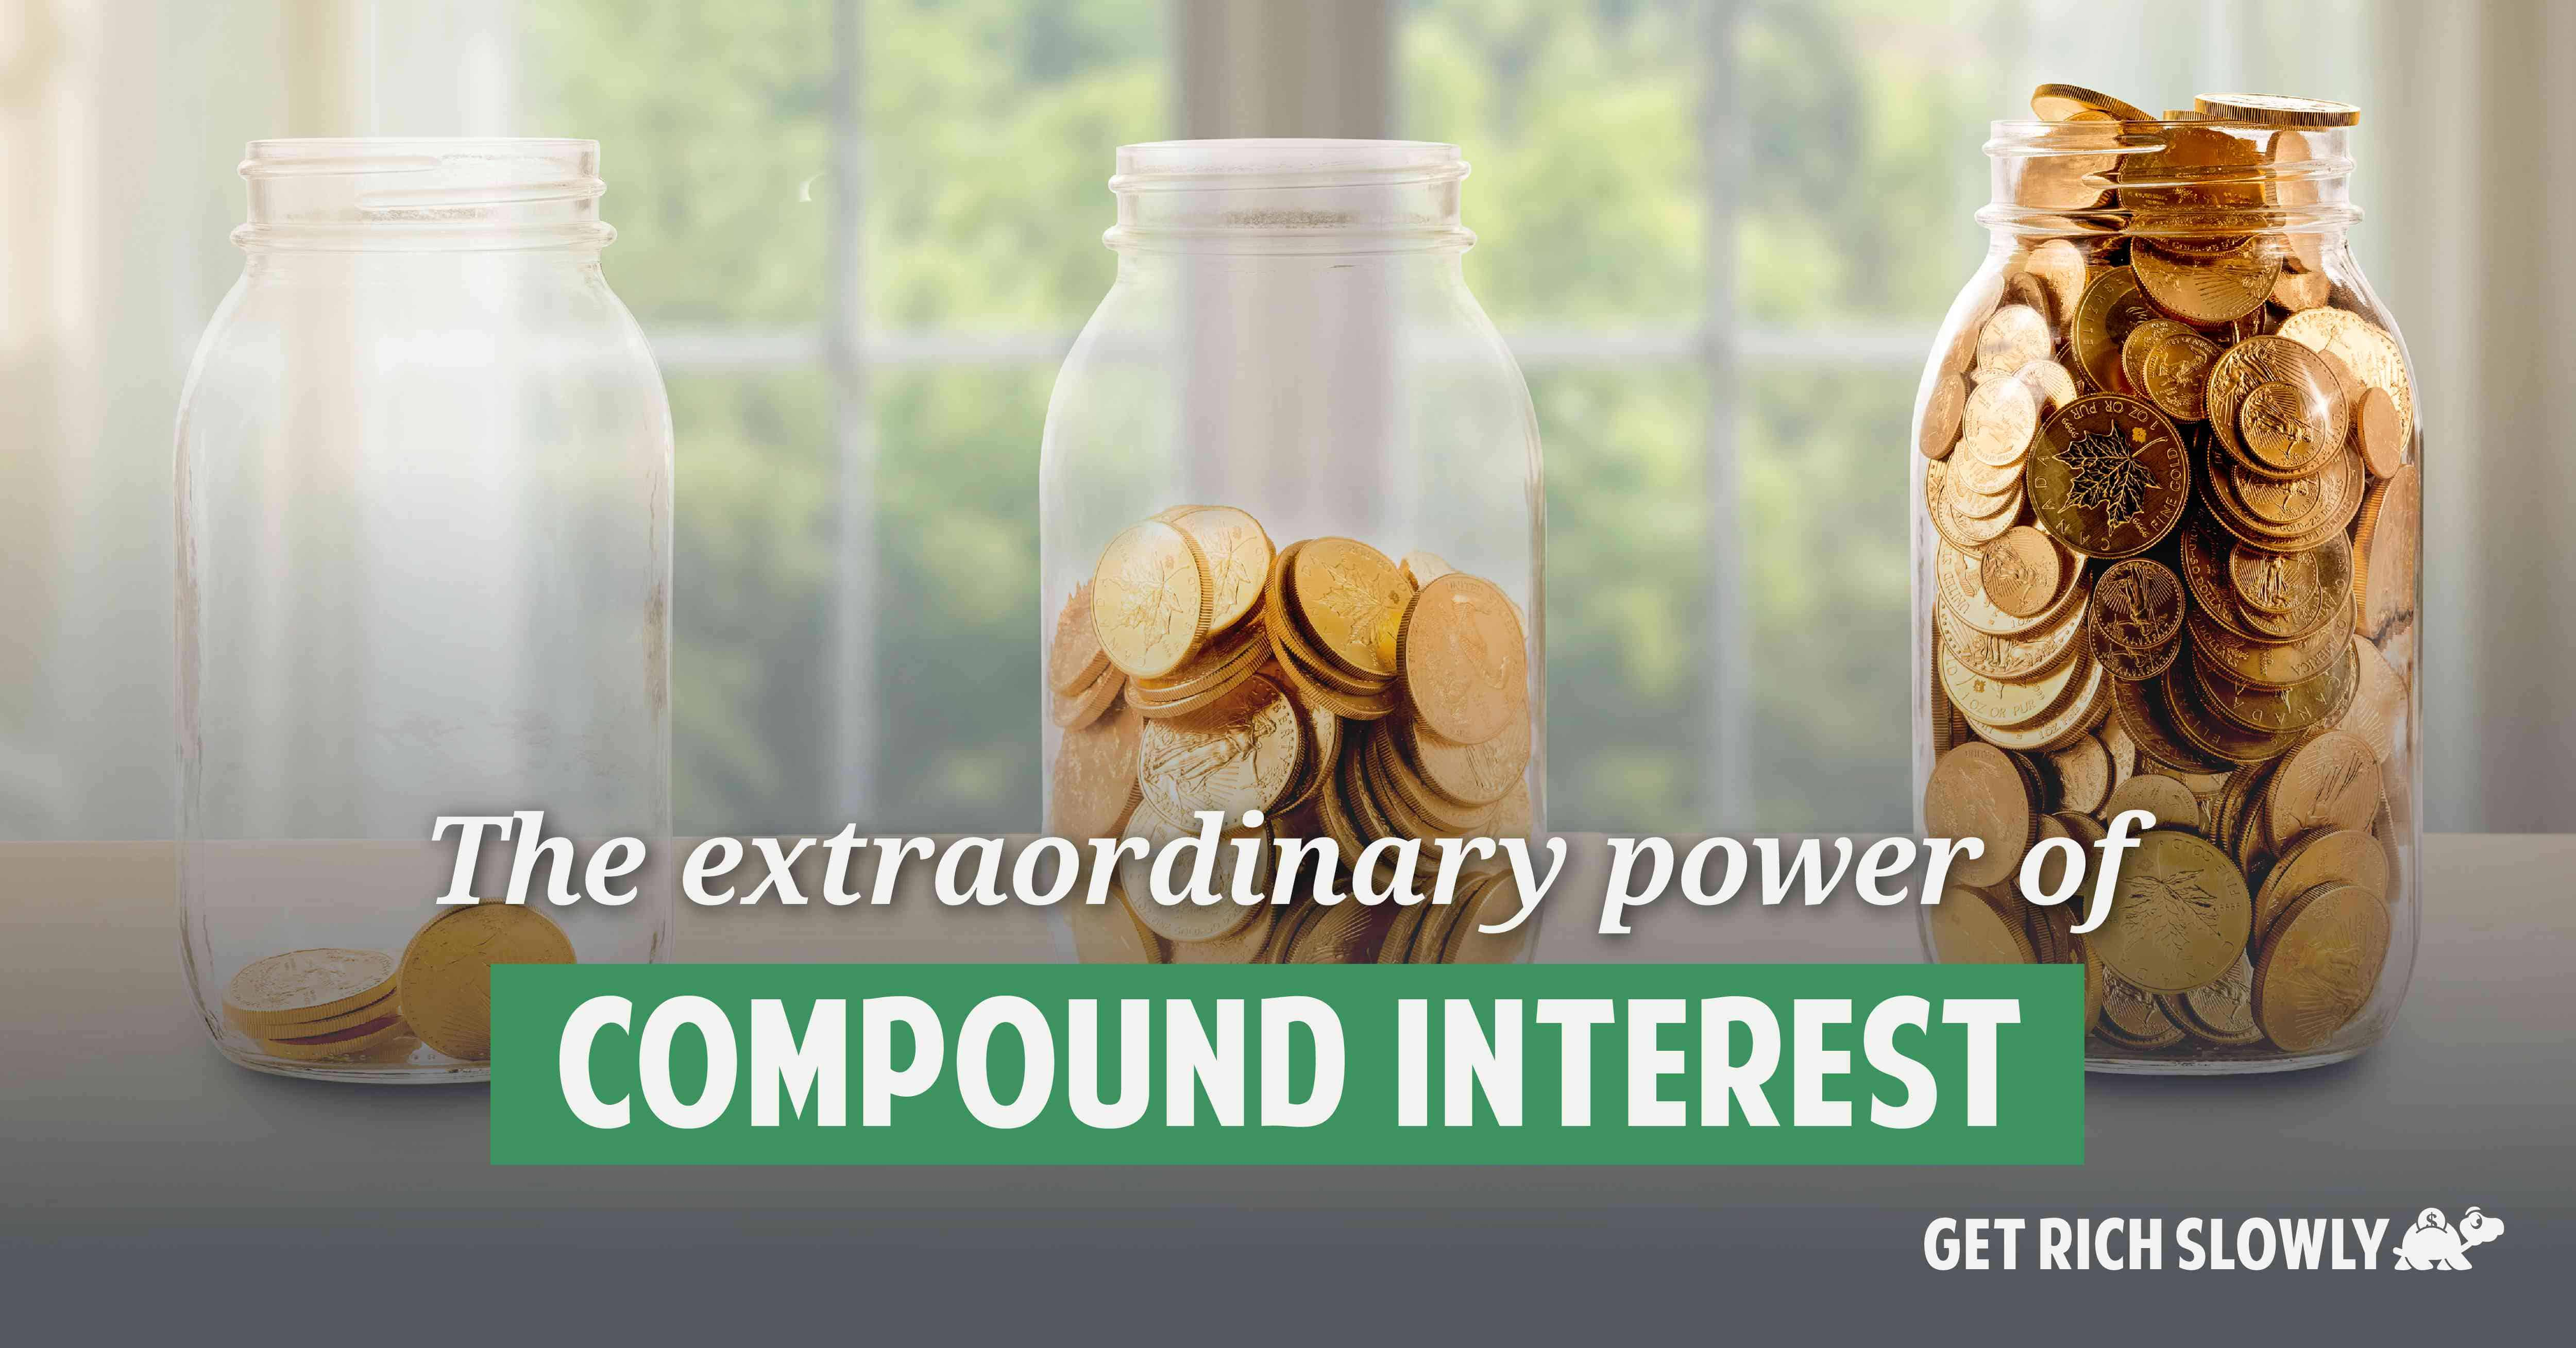 Compound interest vs. increased income — Which matters more?